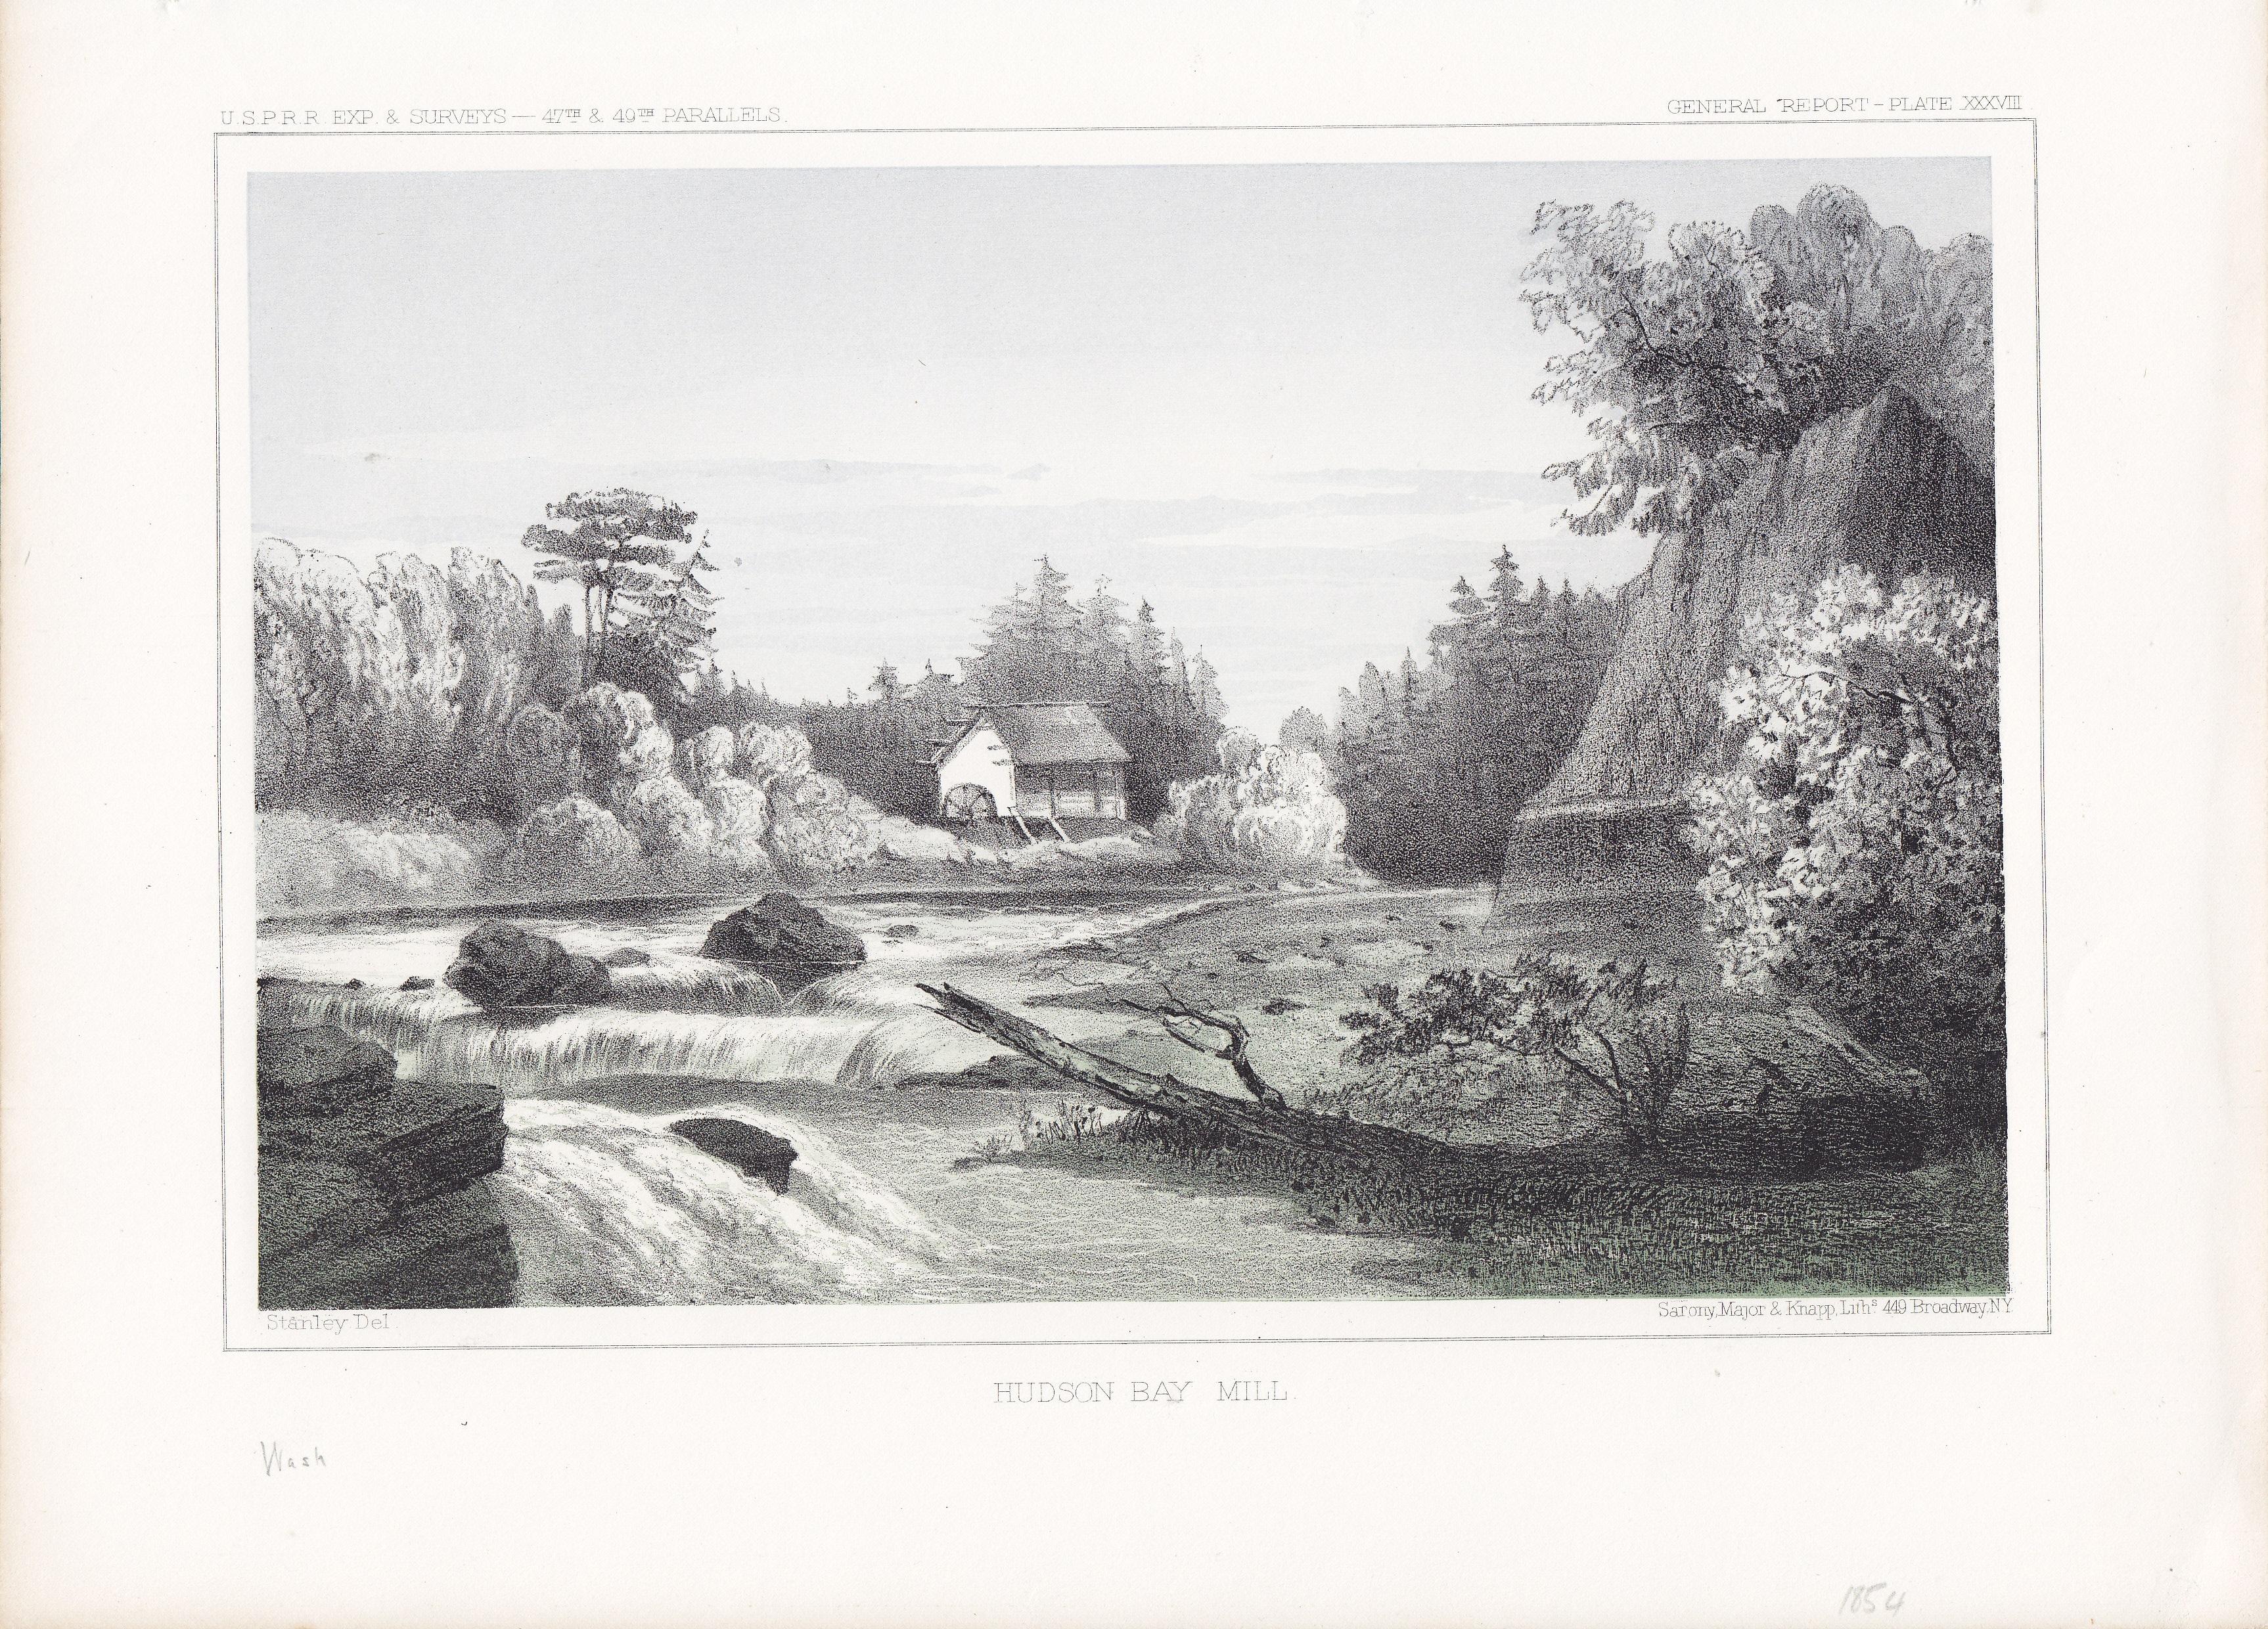 Hudson Bay Mill